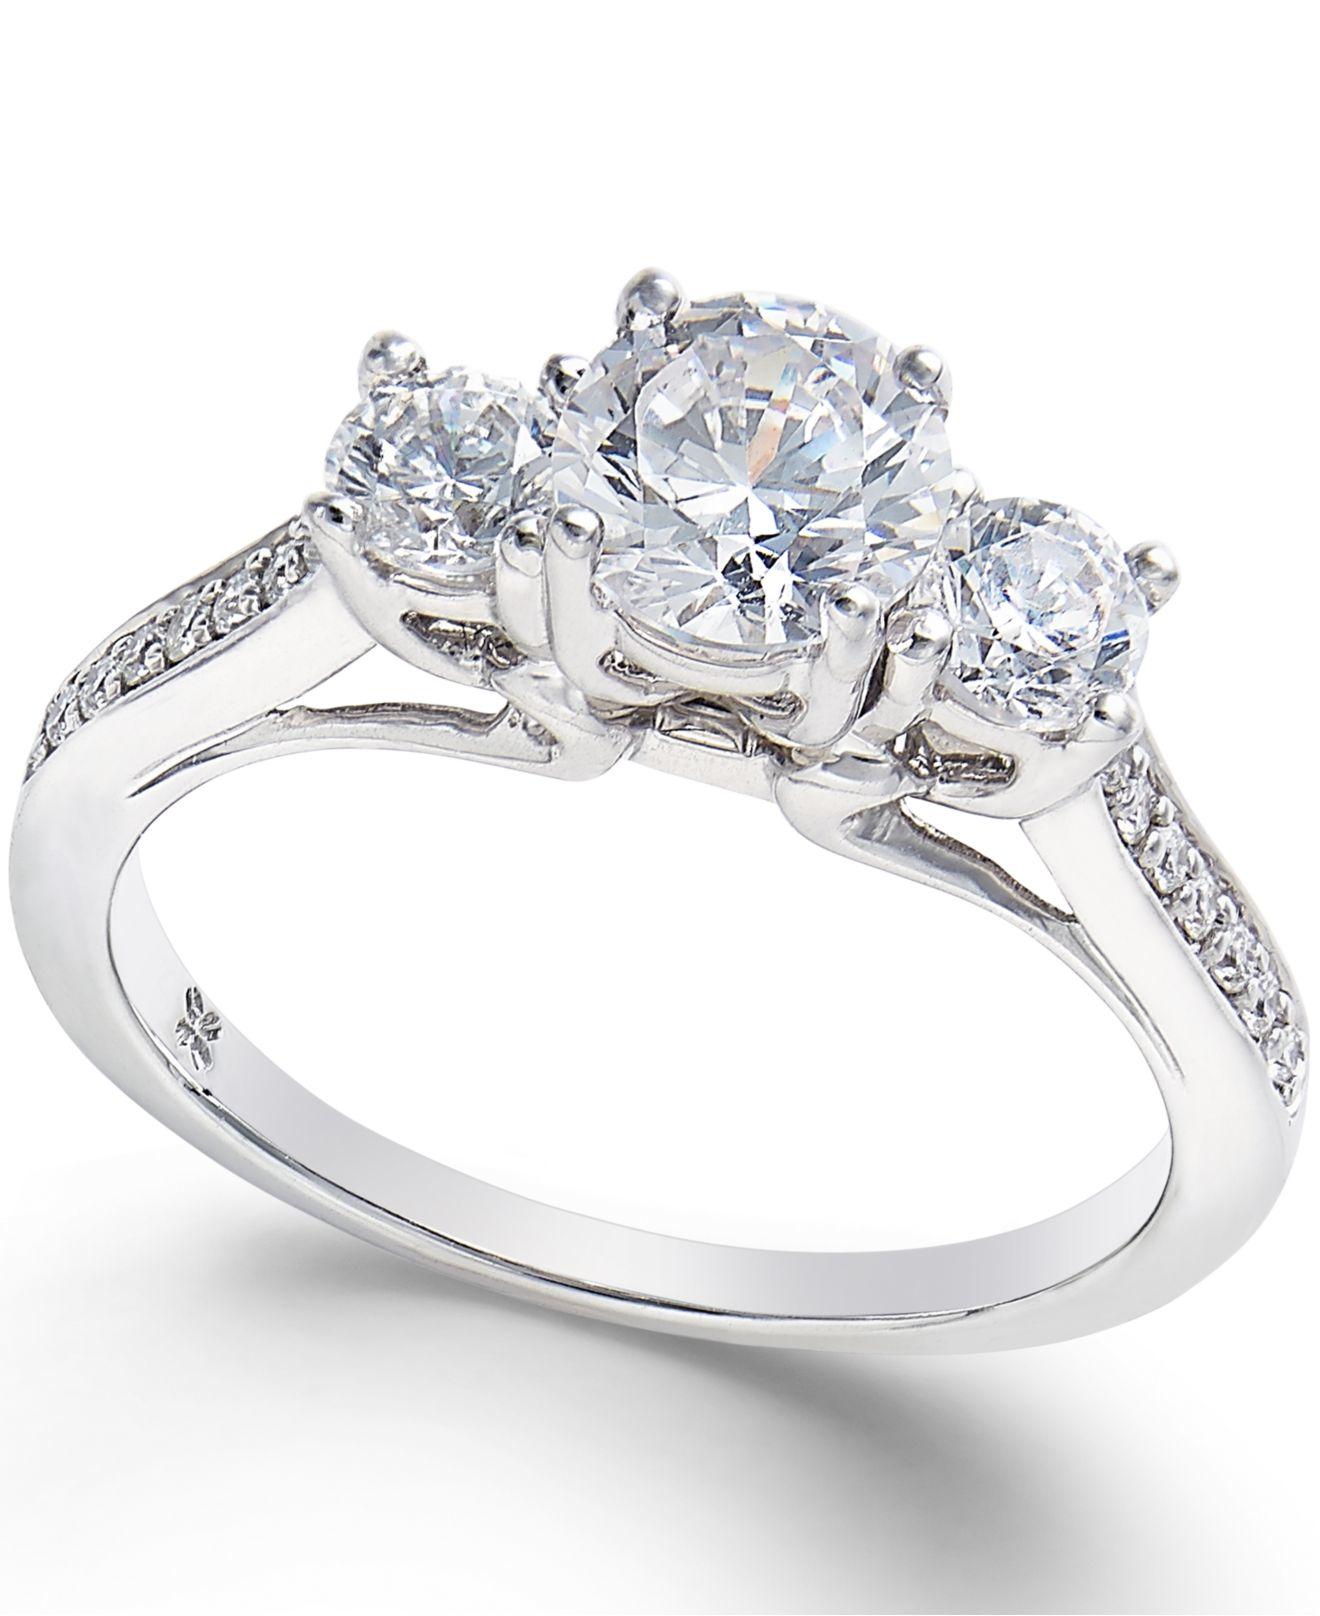 Macy's Diamond 3-stone Engagement Ring (1-1/10 Ct. T.w